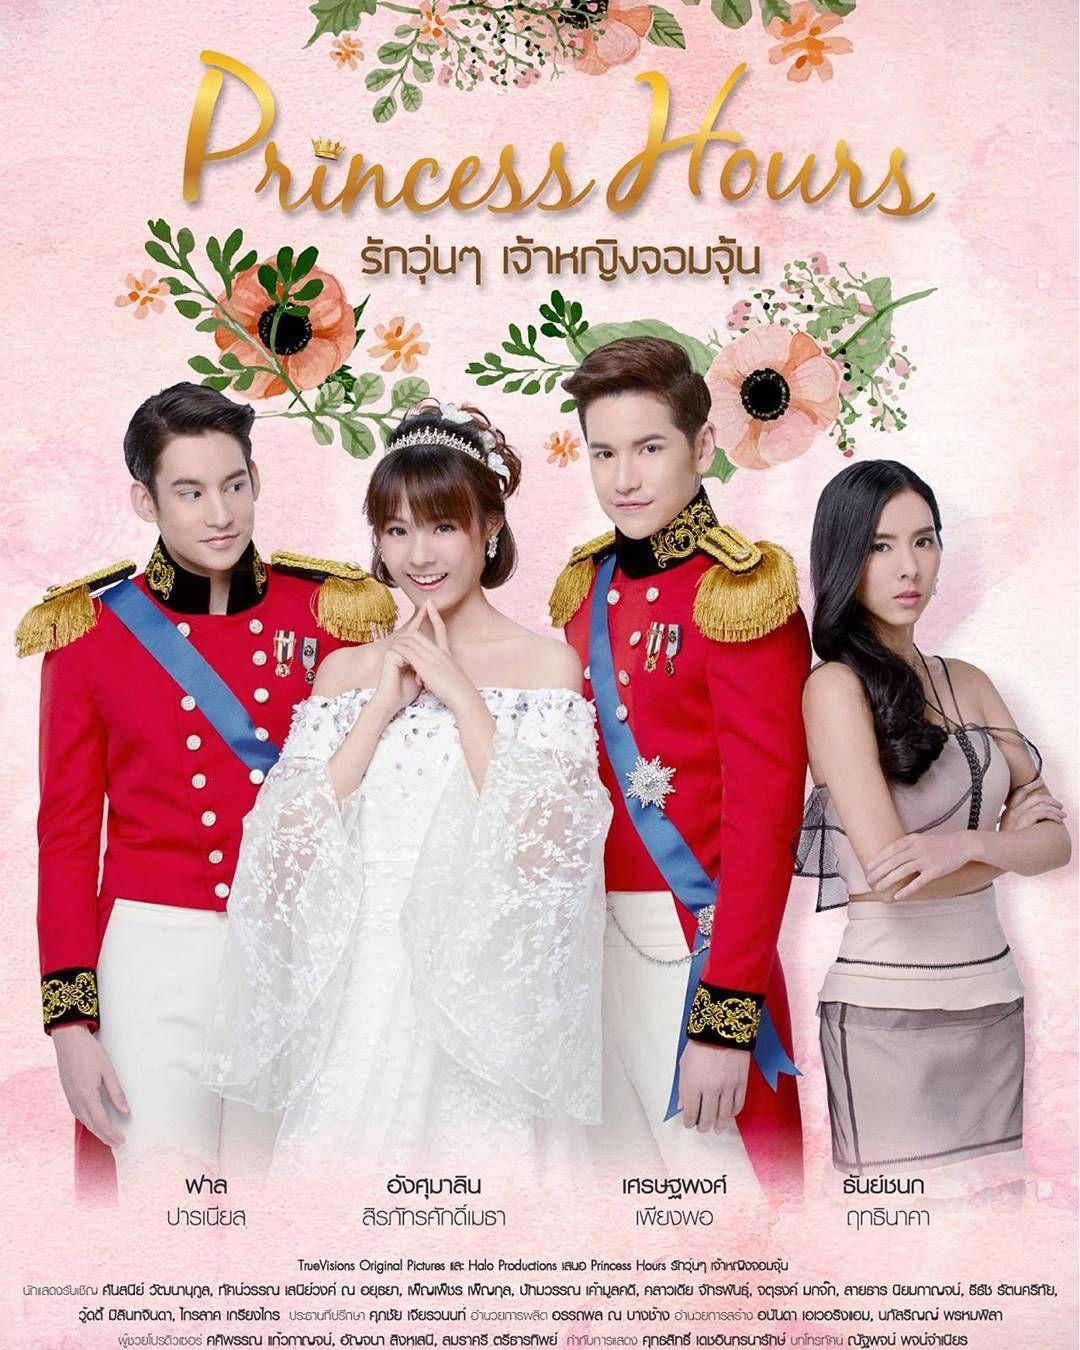 Princess Hours (2017) Princess hours, Princess hours